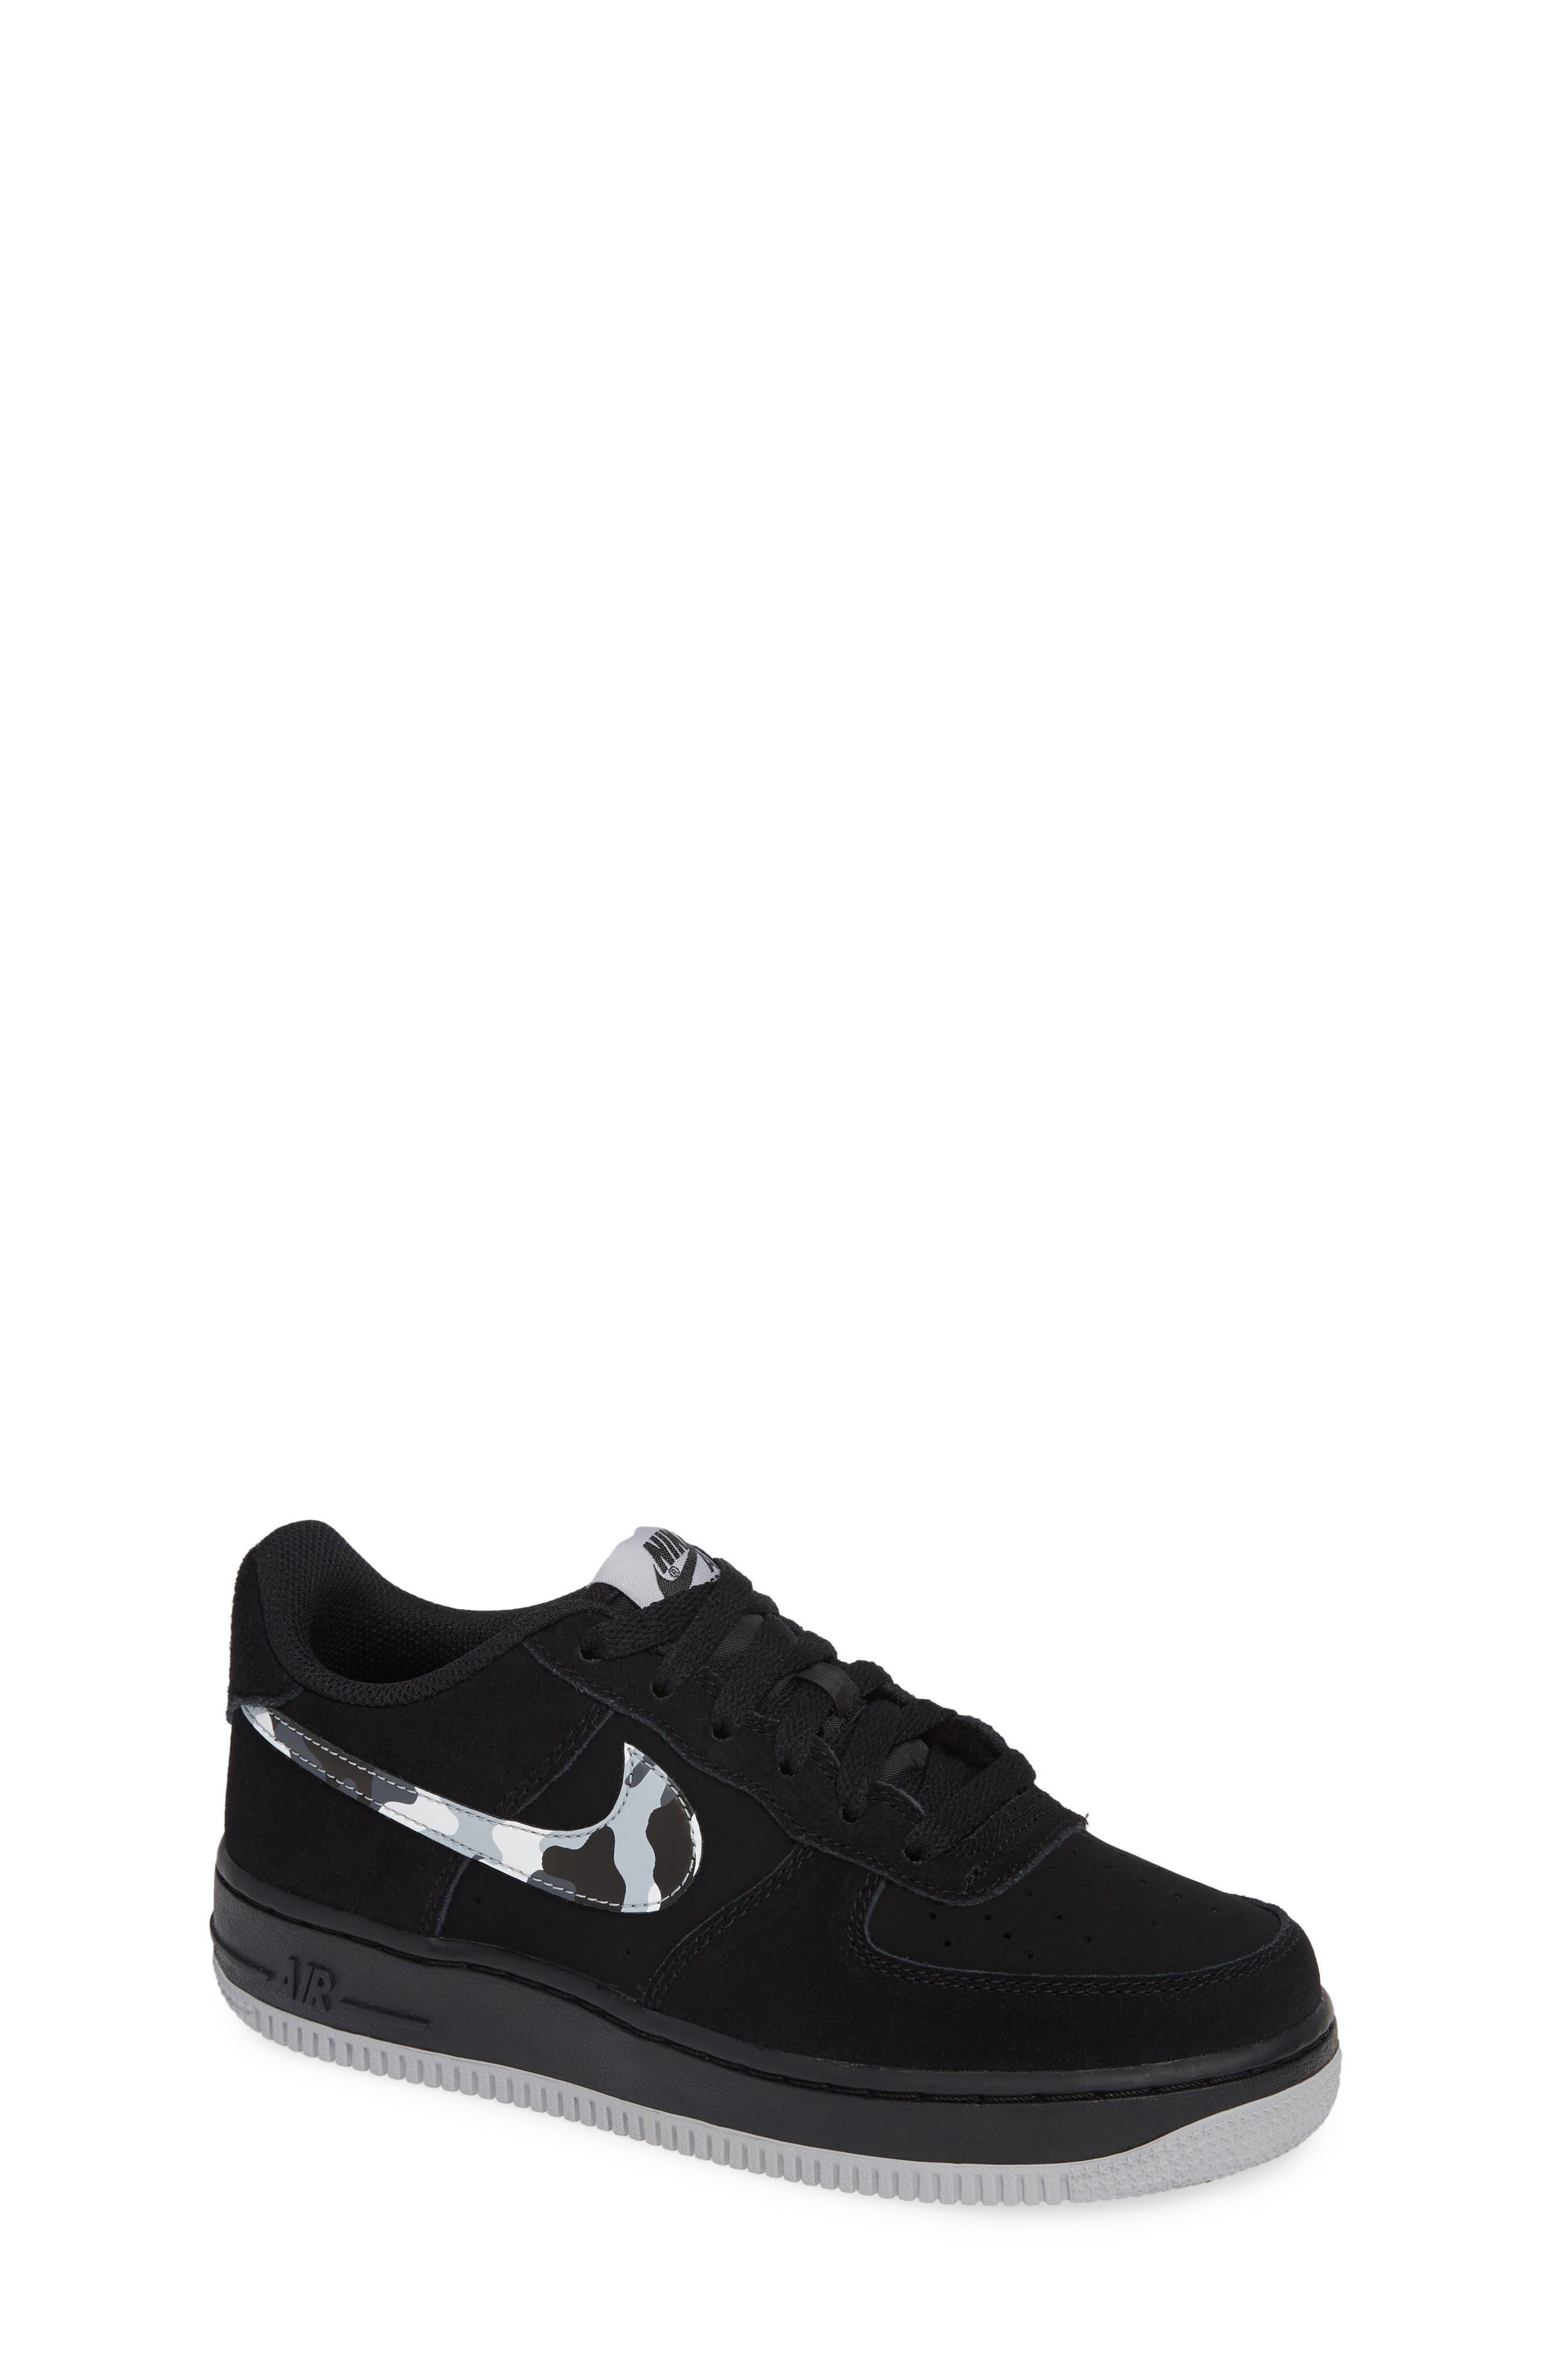 Air Force 1 Sneaker,                         Main,                         color, BLACK/ GREY/ WHITE